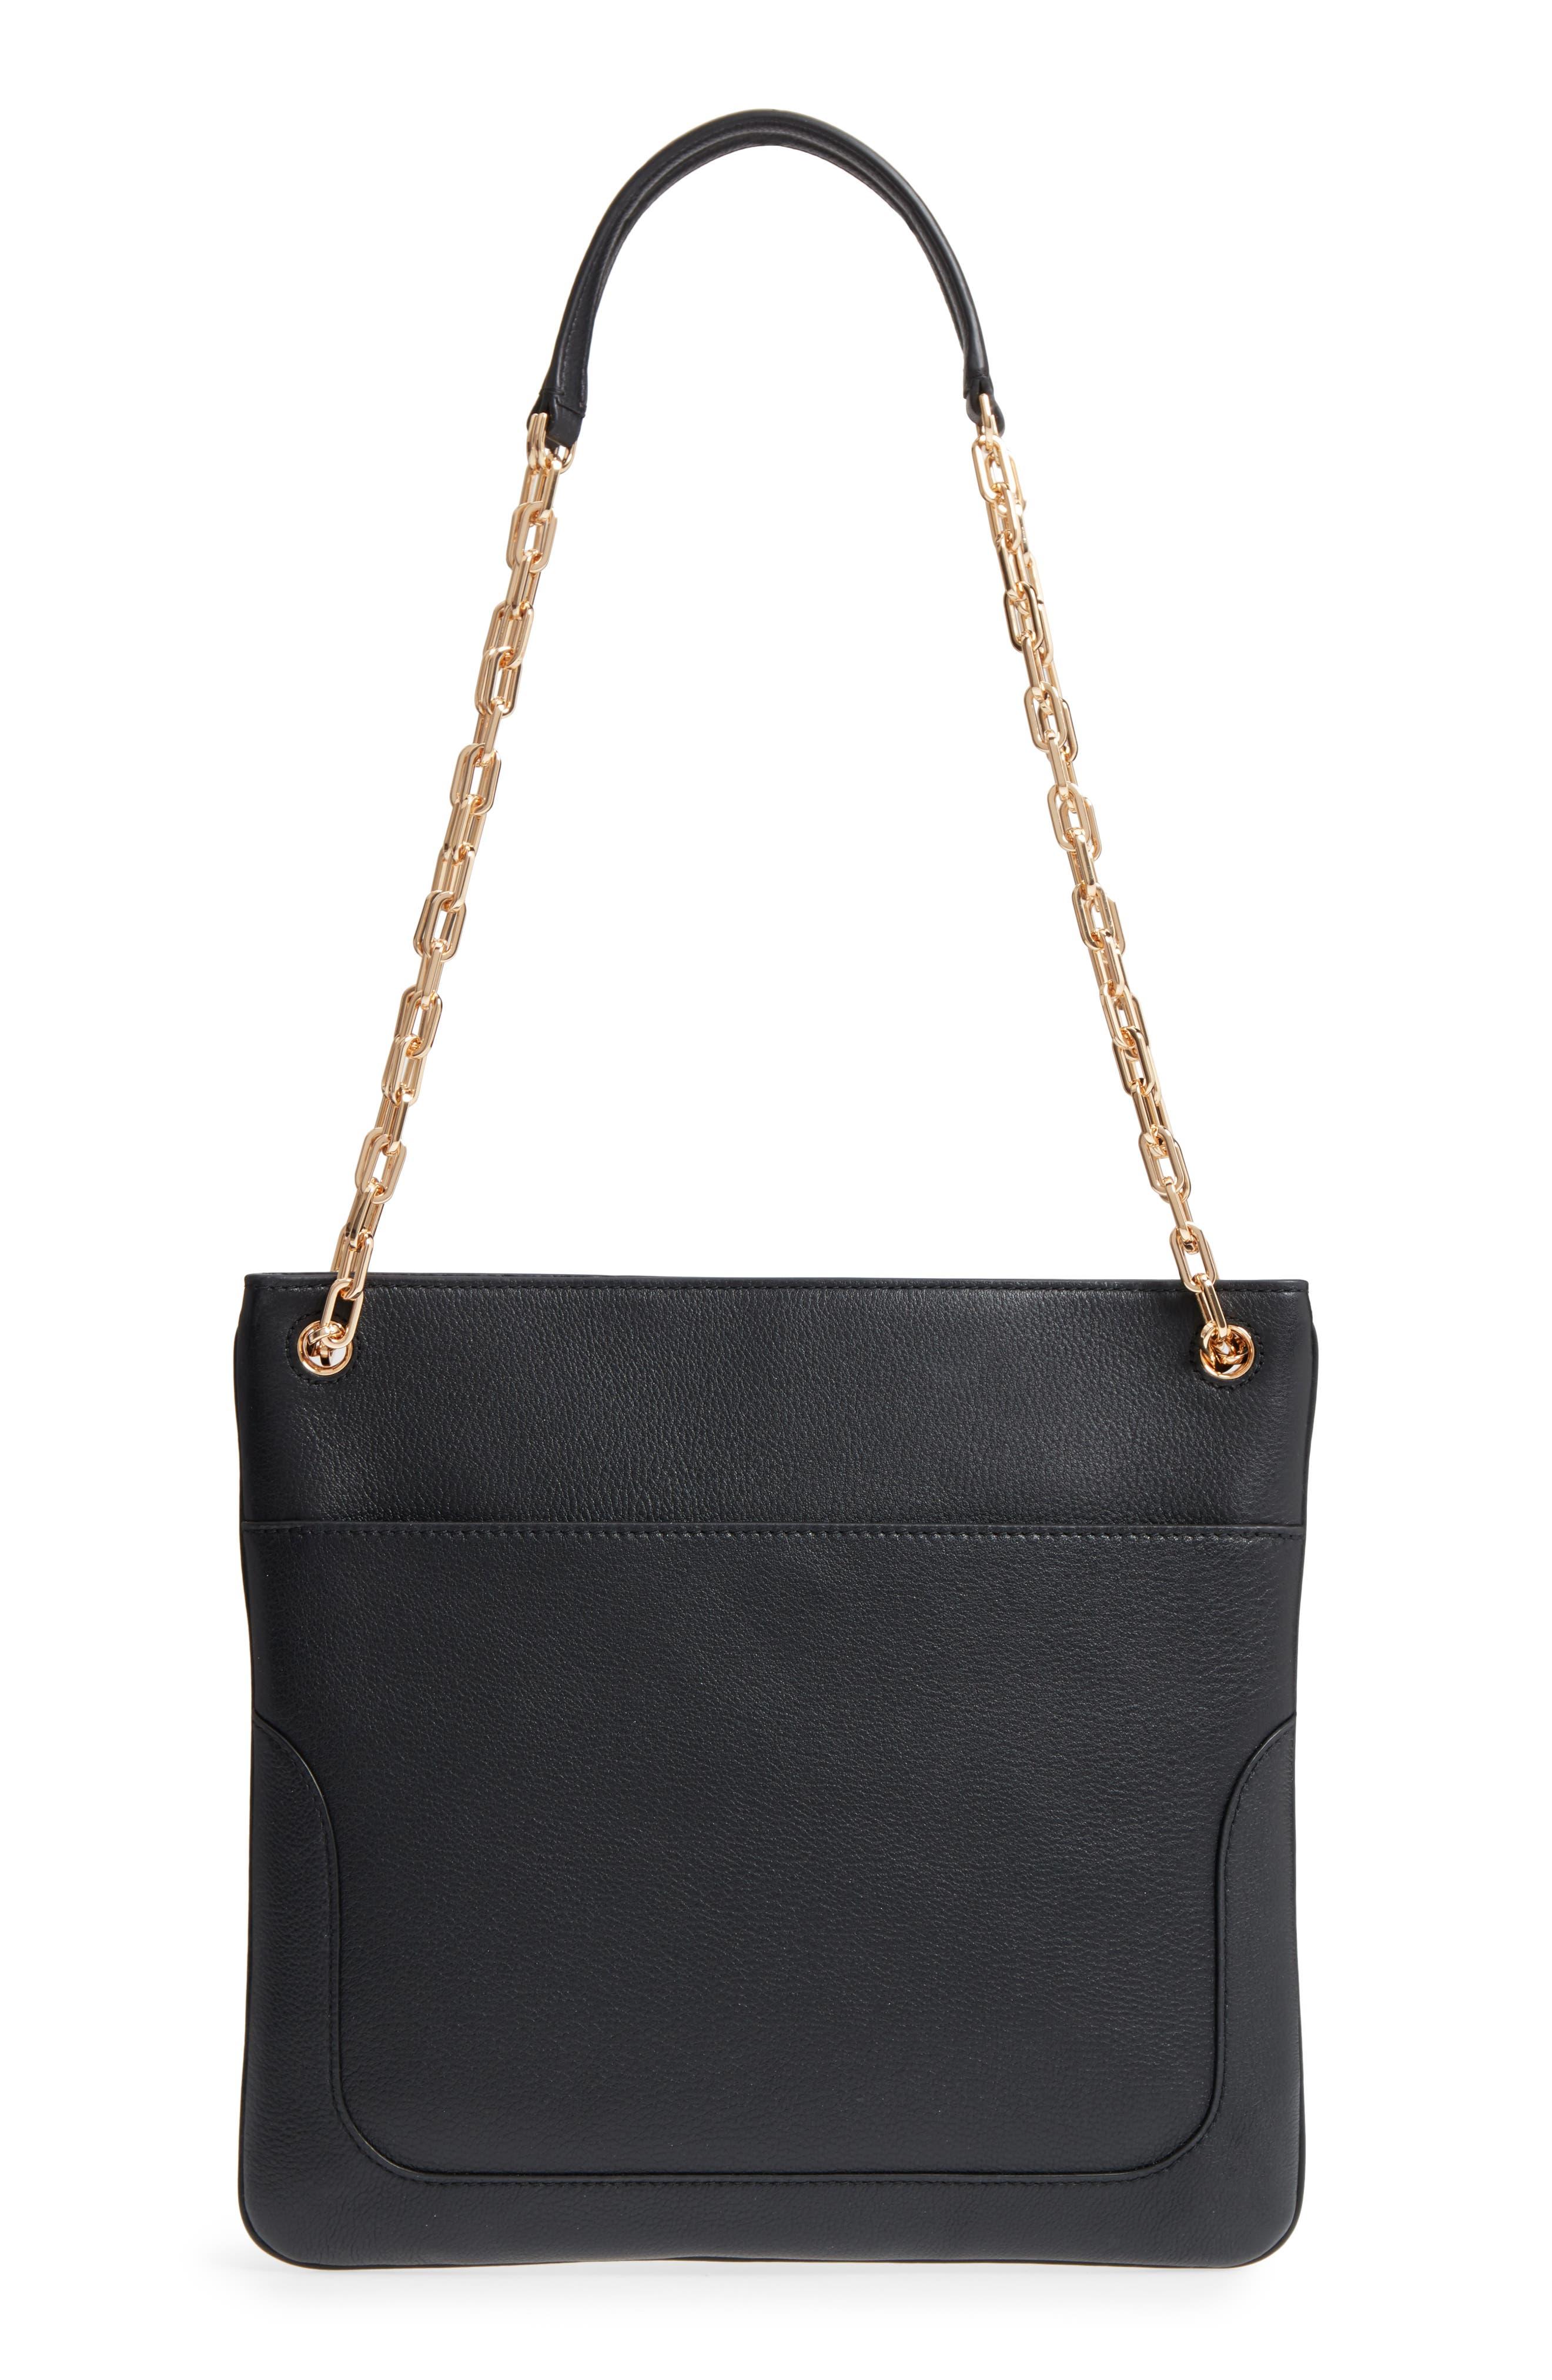 TORY BURCH, Marsden Swingpack Leather Crossbody Bag, Alternate thumbnail 3, color, 001